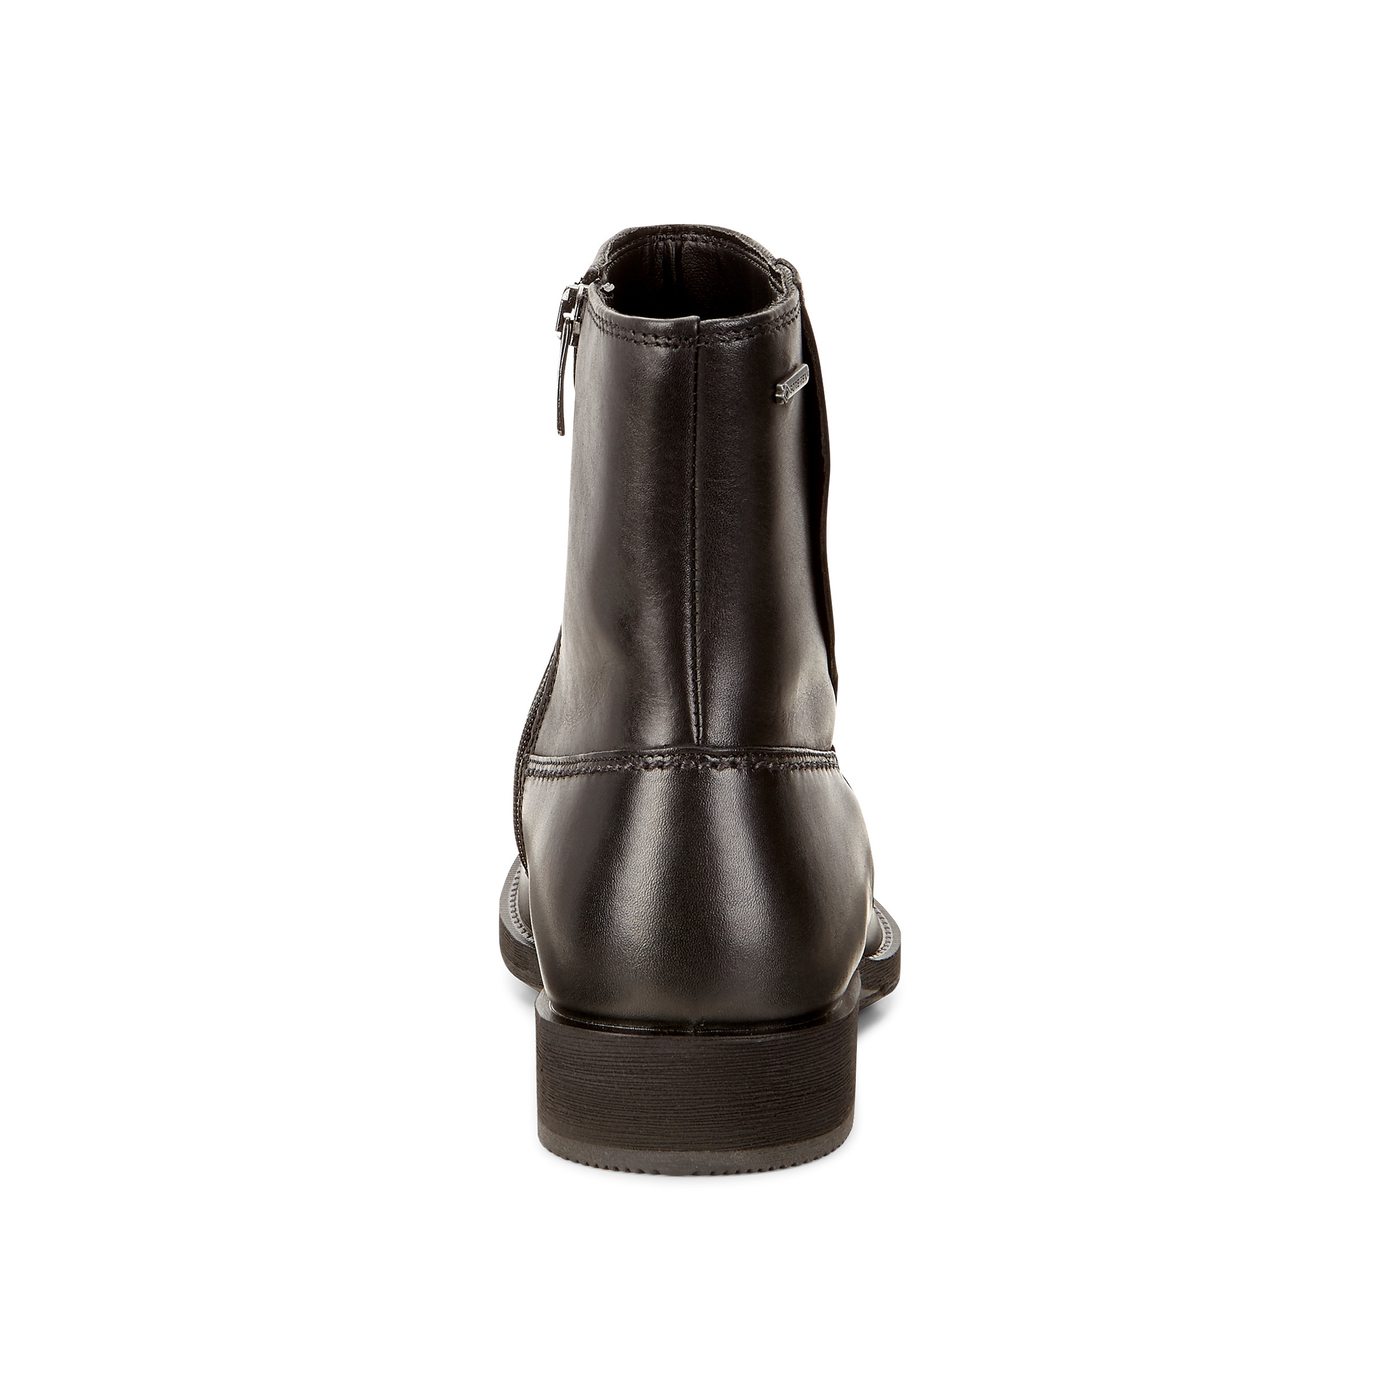 ECCO SAUNTER Leather Boot GTX